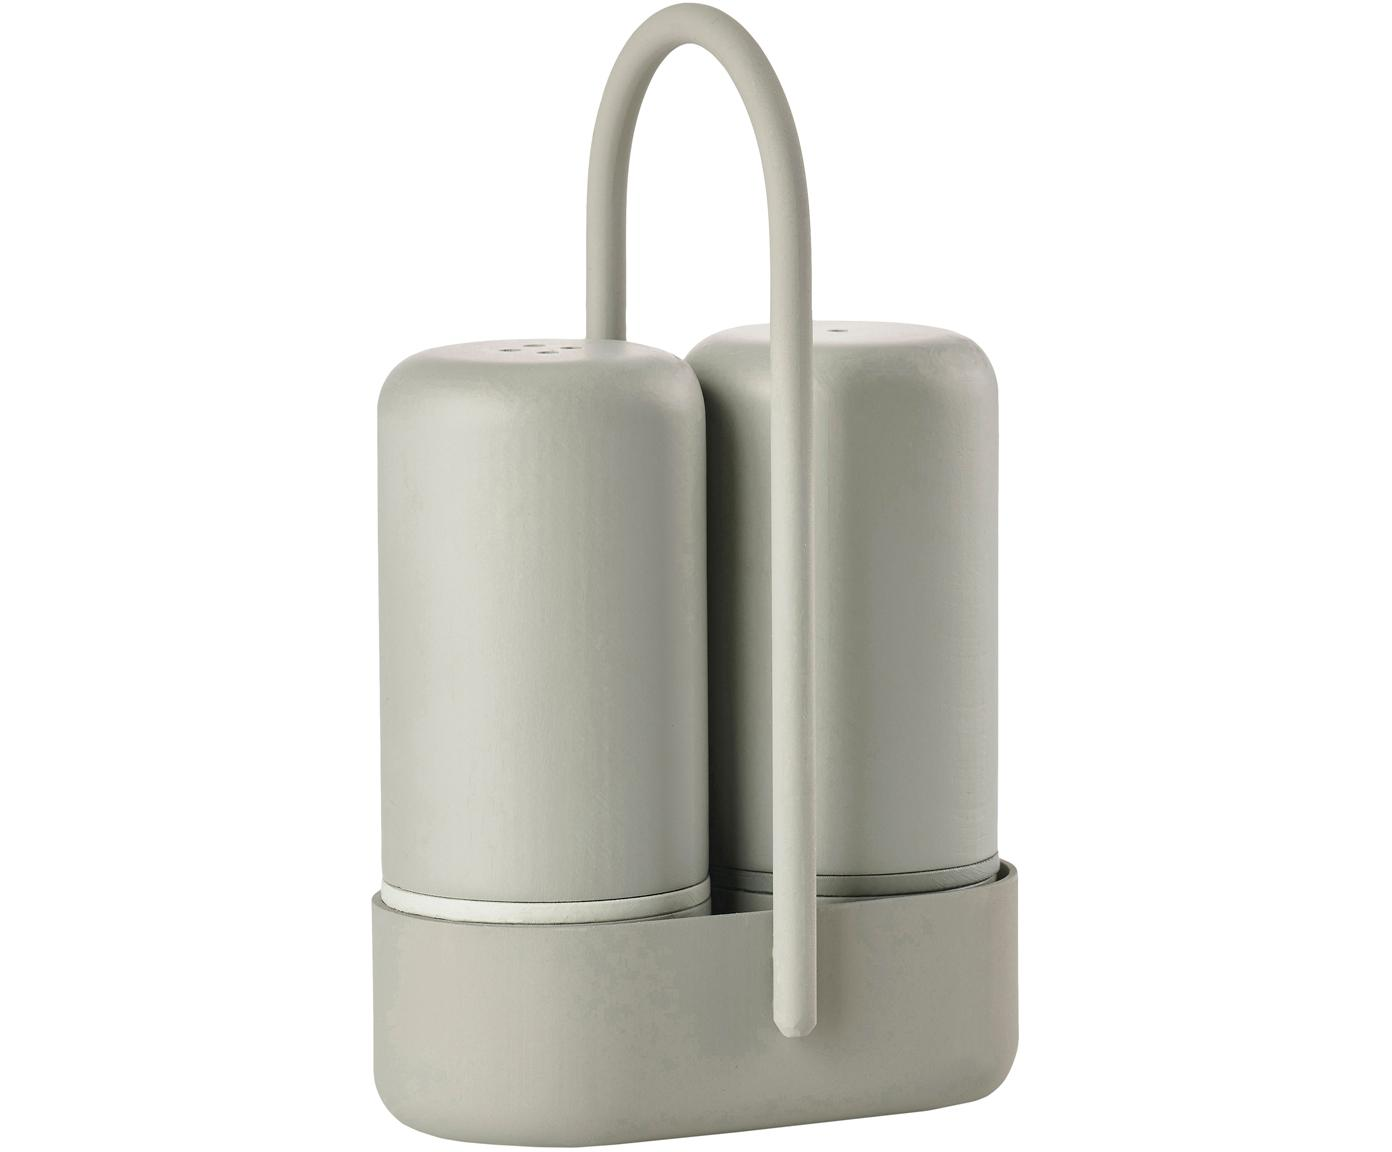 Salero y pimentero Henk, 2pzas., Plástico (ABS), metal, Greige, An 7 x F 3 cm